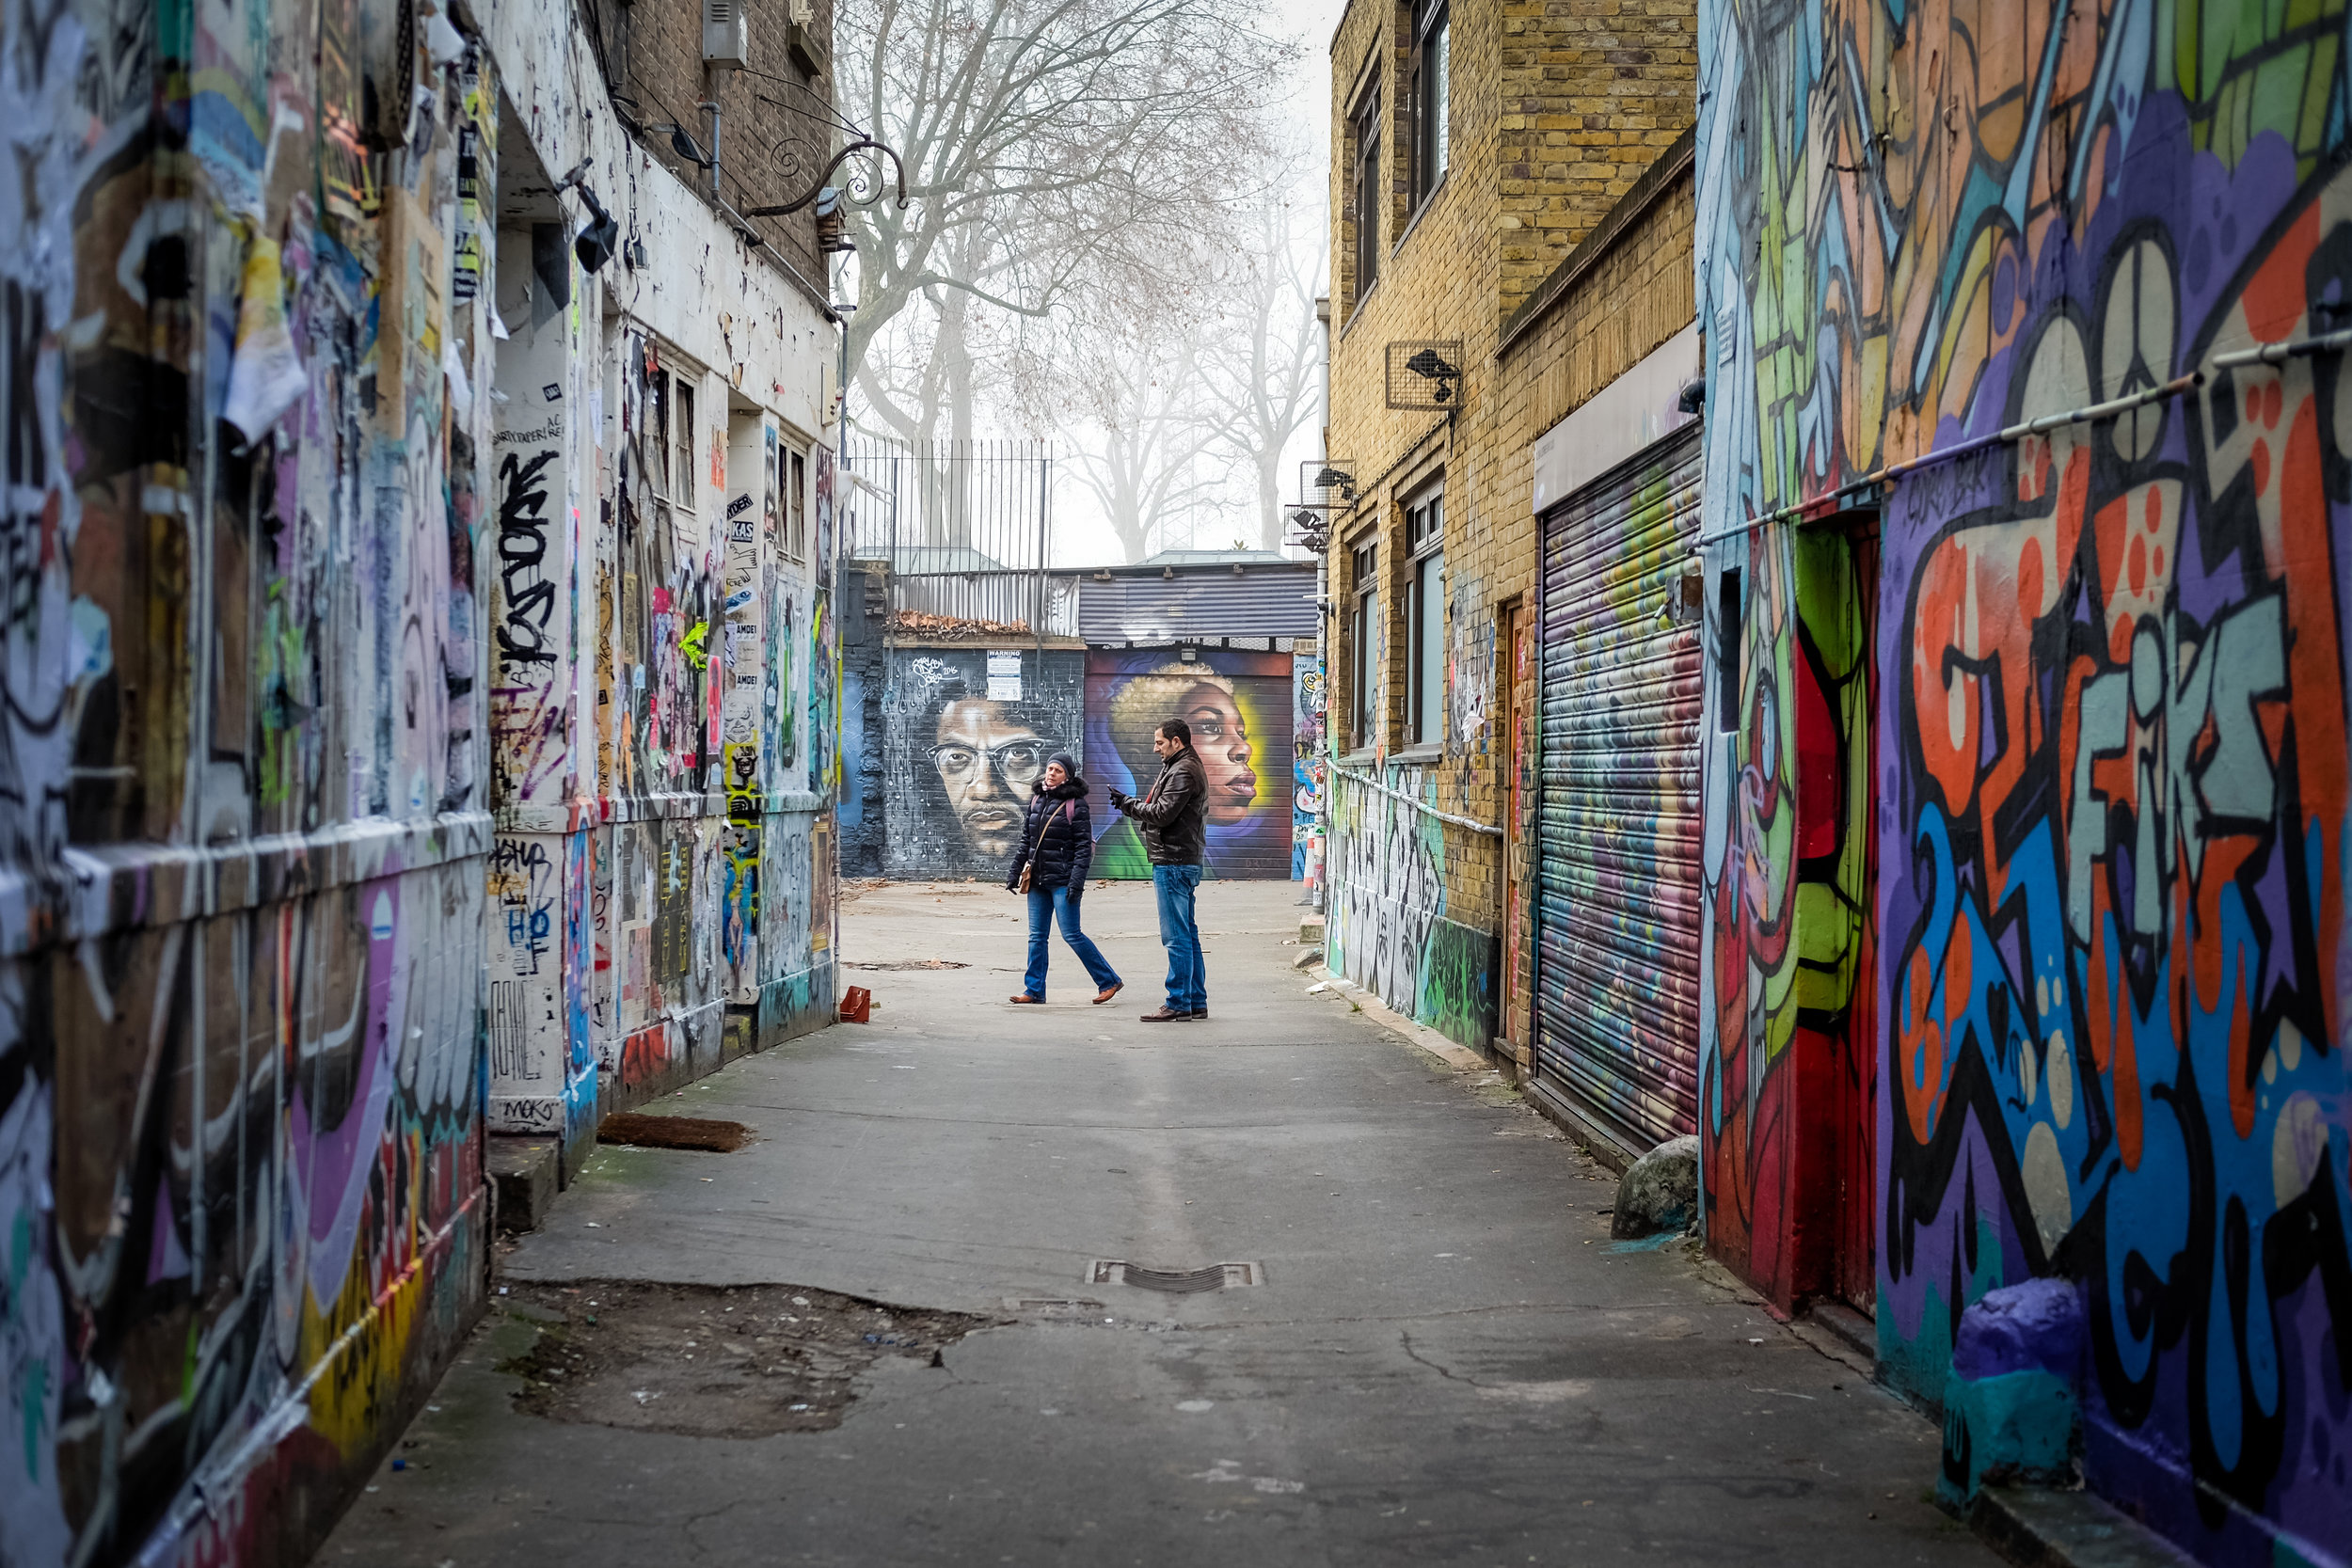 Alleyway of urban art